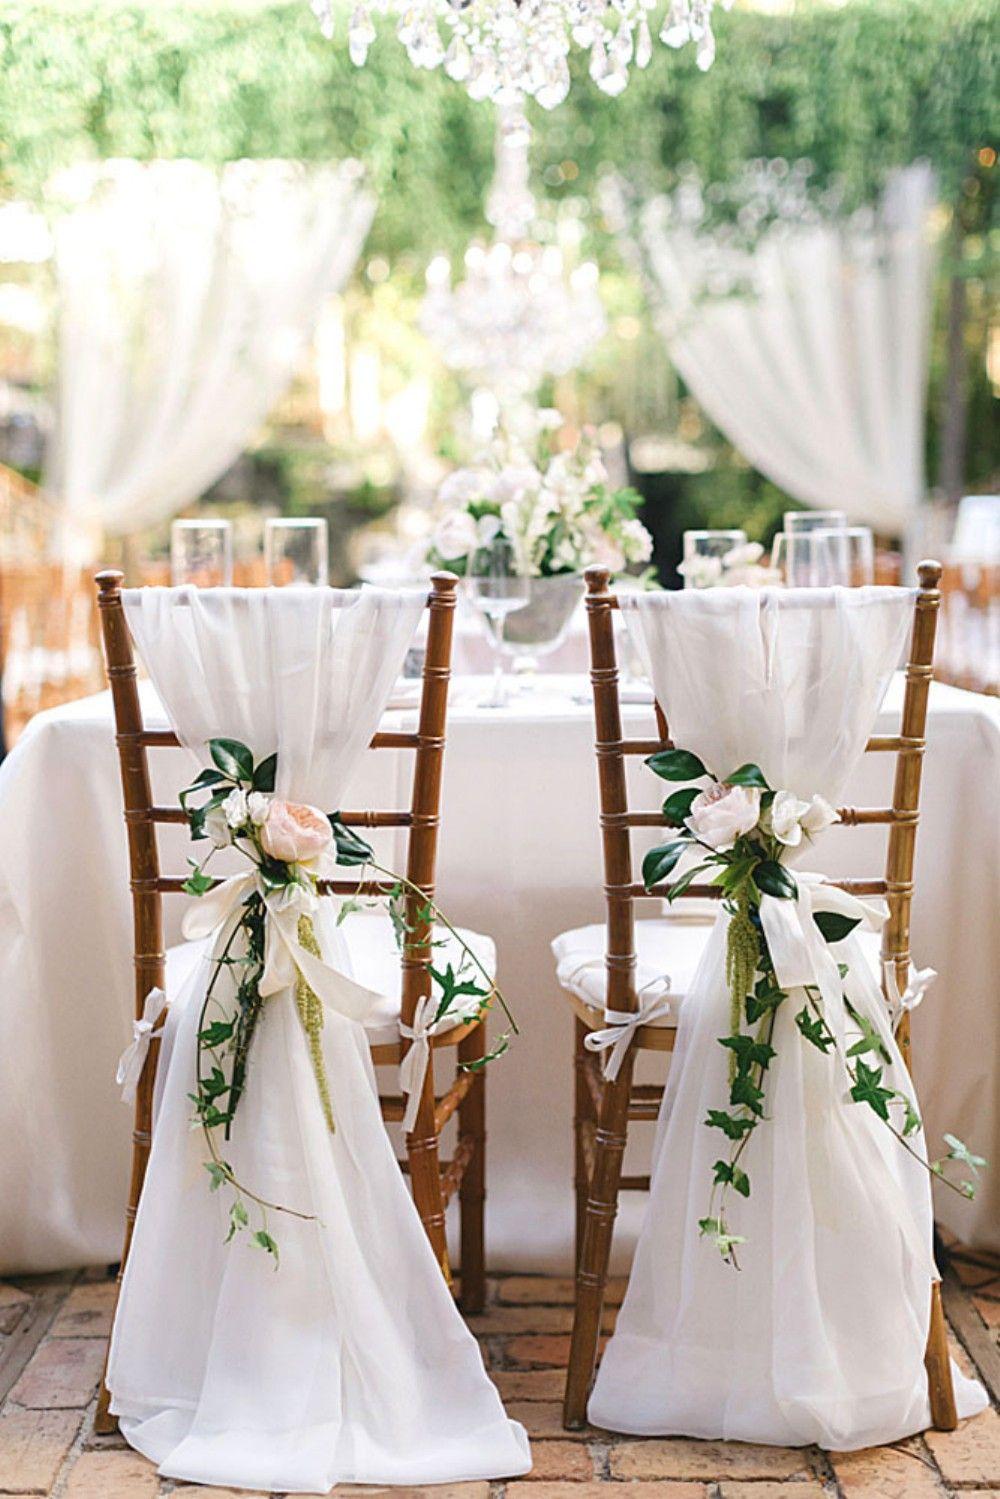 nice 21 Shabby & Chic Vintage Wedding Decor Ideas  https://viscawedding.com/2017/04/09/shabby-chic-vintage-wedding-decor-ideas/